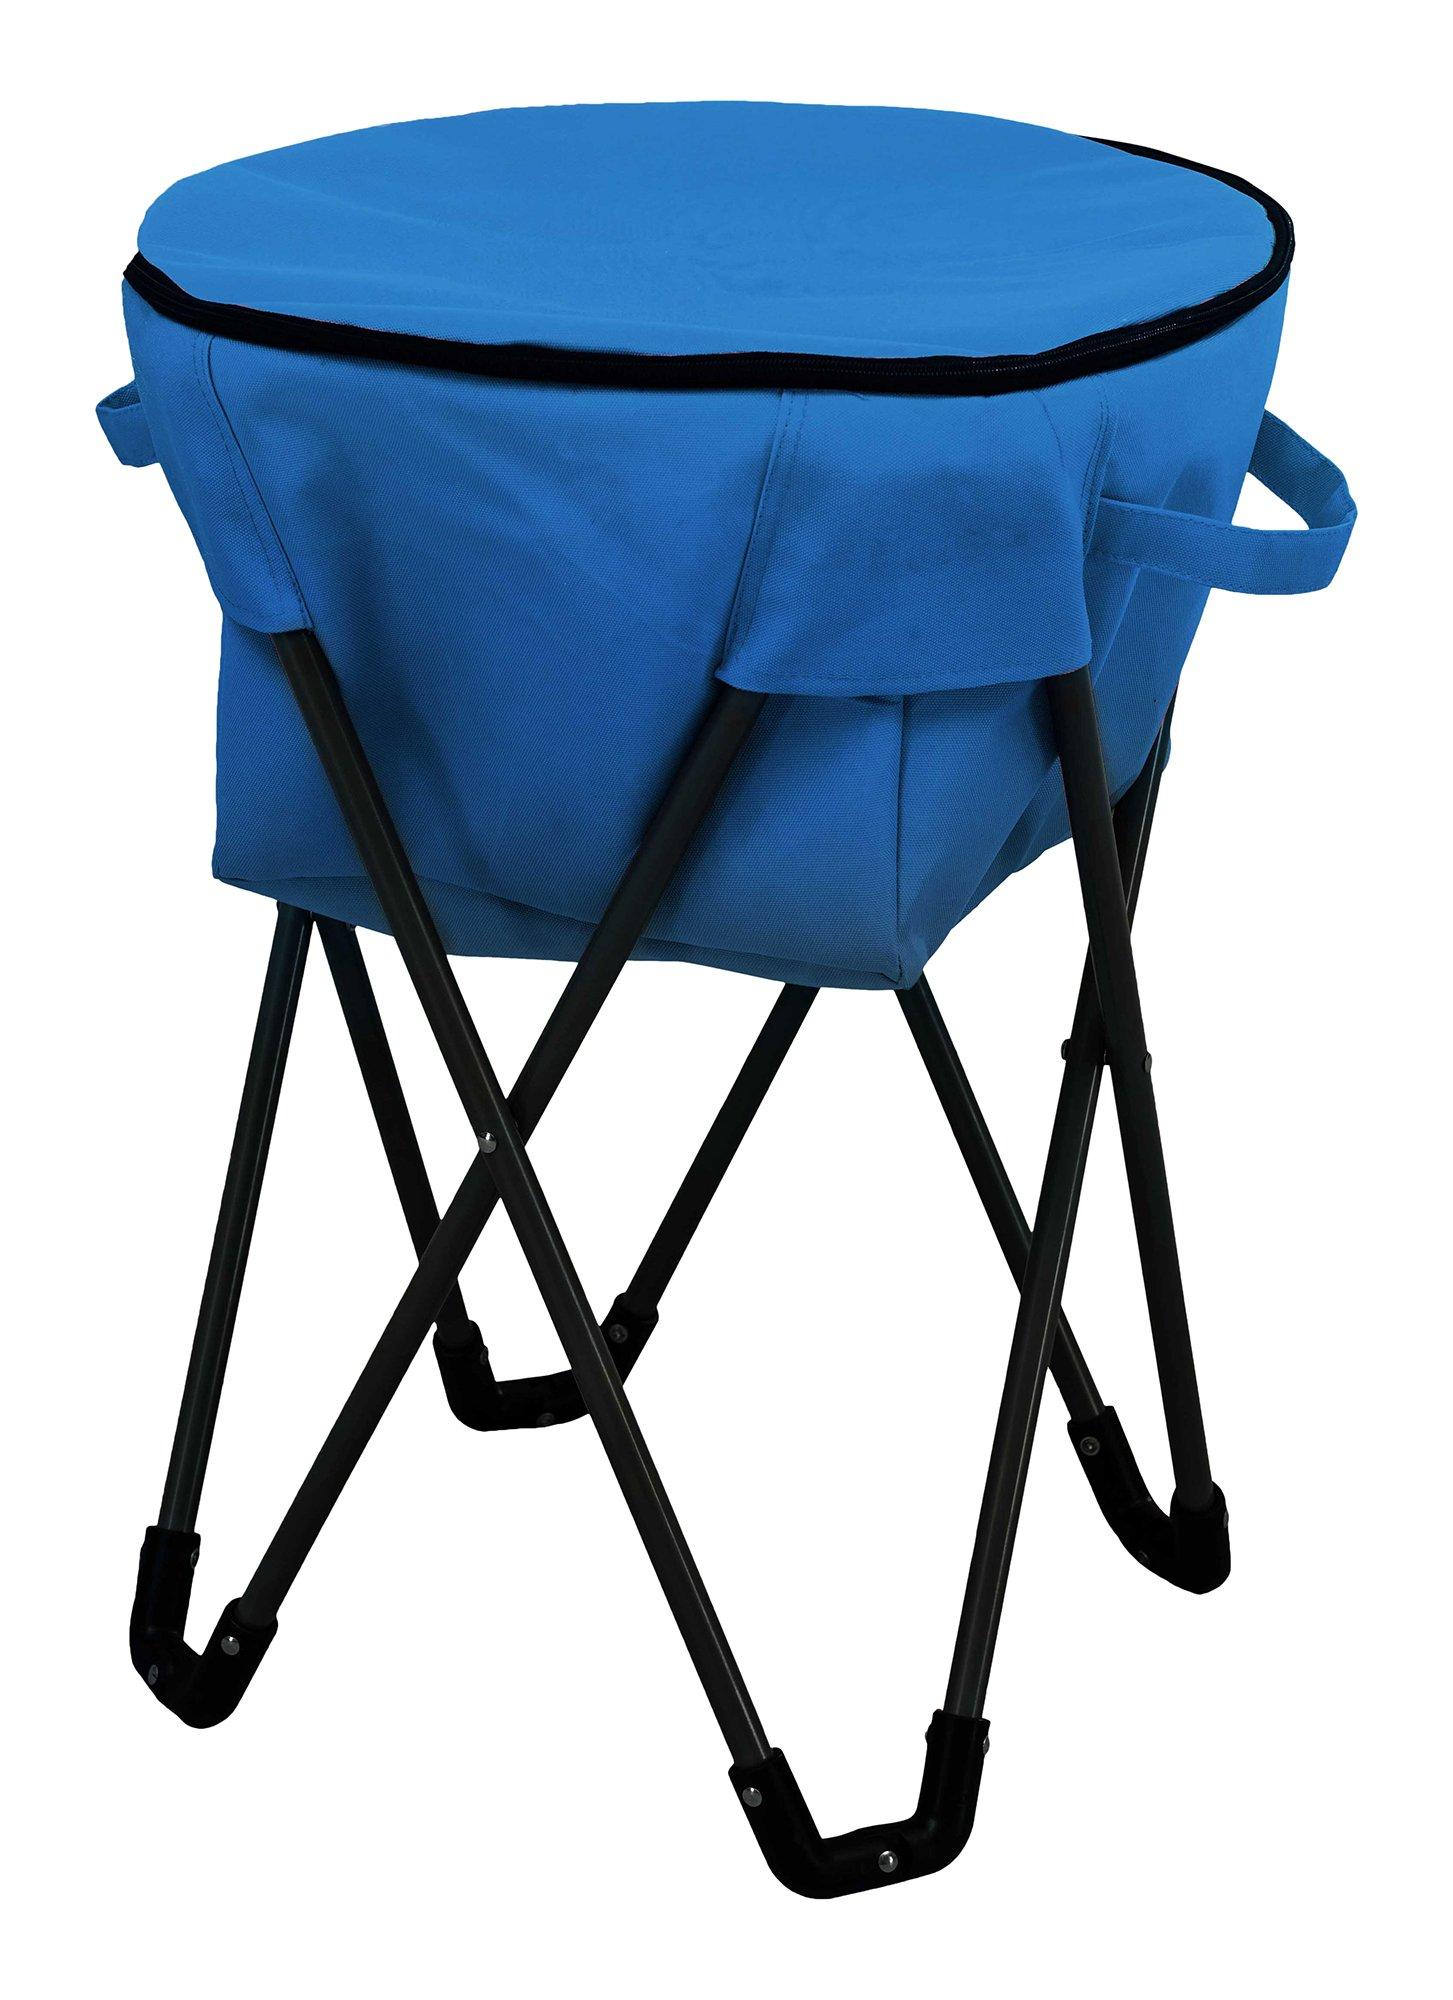 Sunjoy Folding Frame Outdoor Ice Cooler Bag, Blue